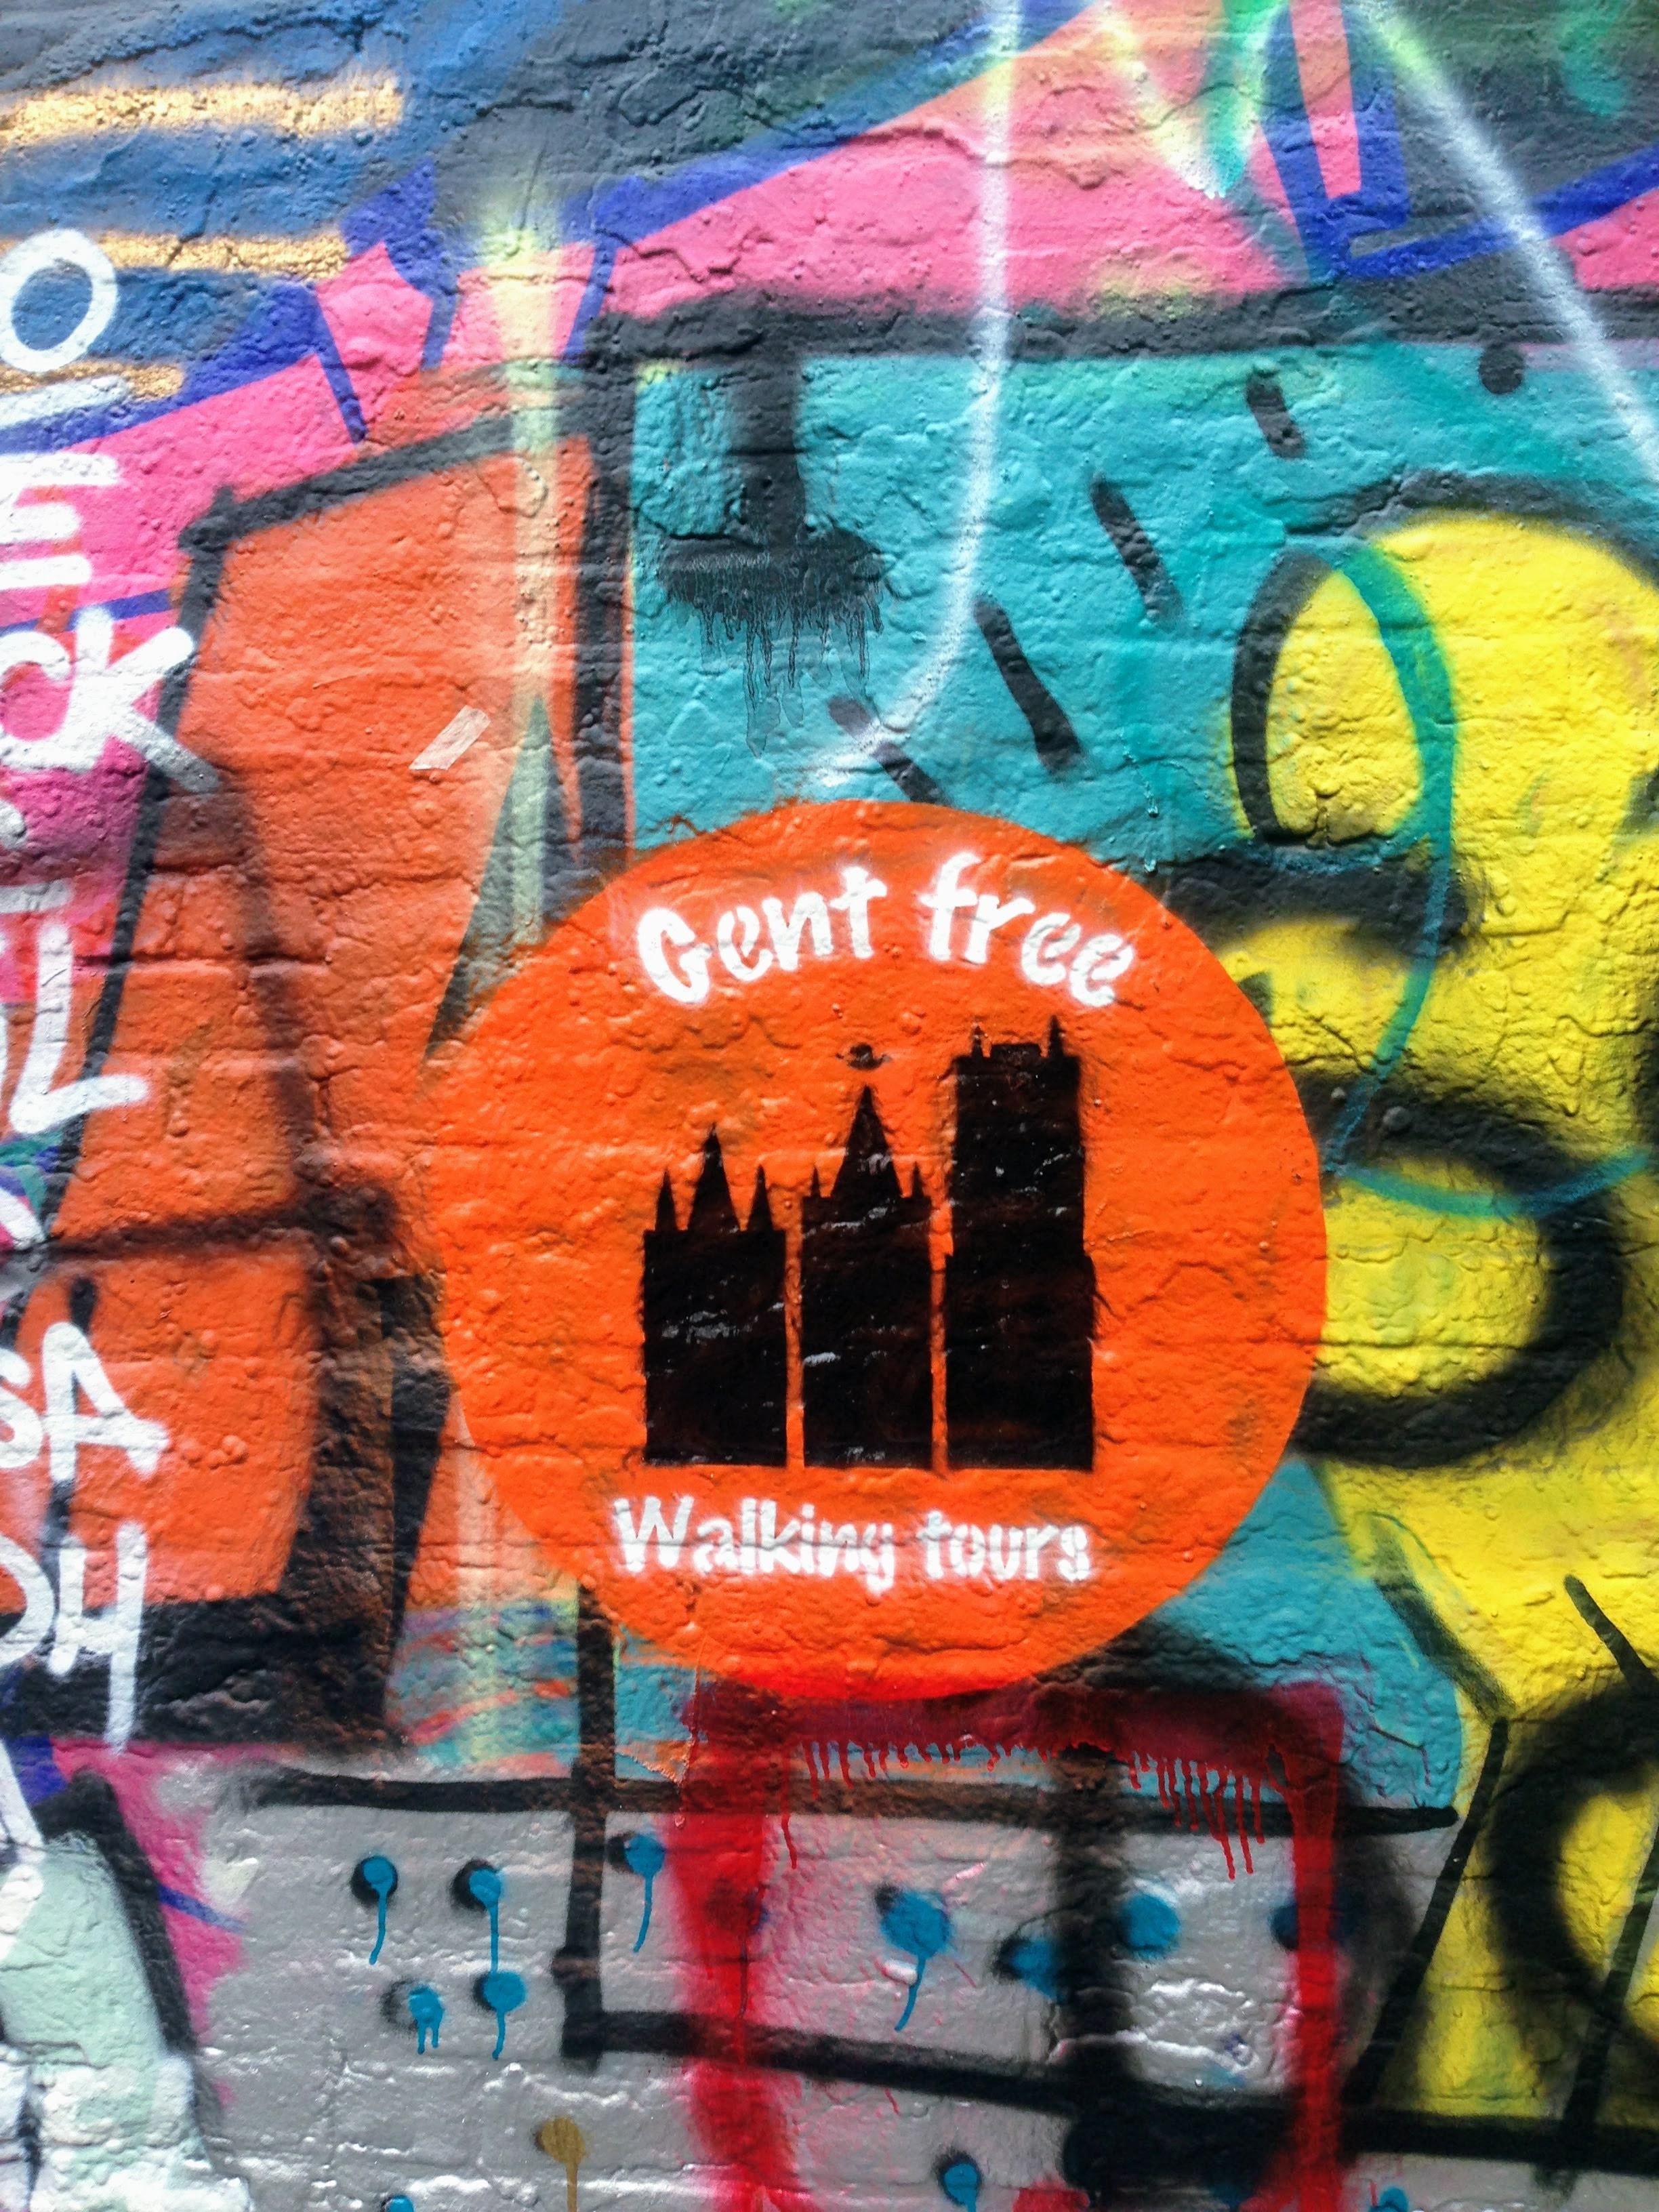 Gent Belgium Ghent Free Walking Tour mural street art off the beaten path solo travel unique t